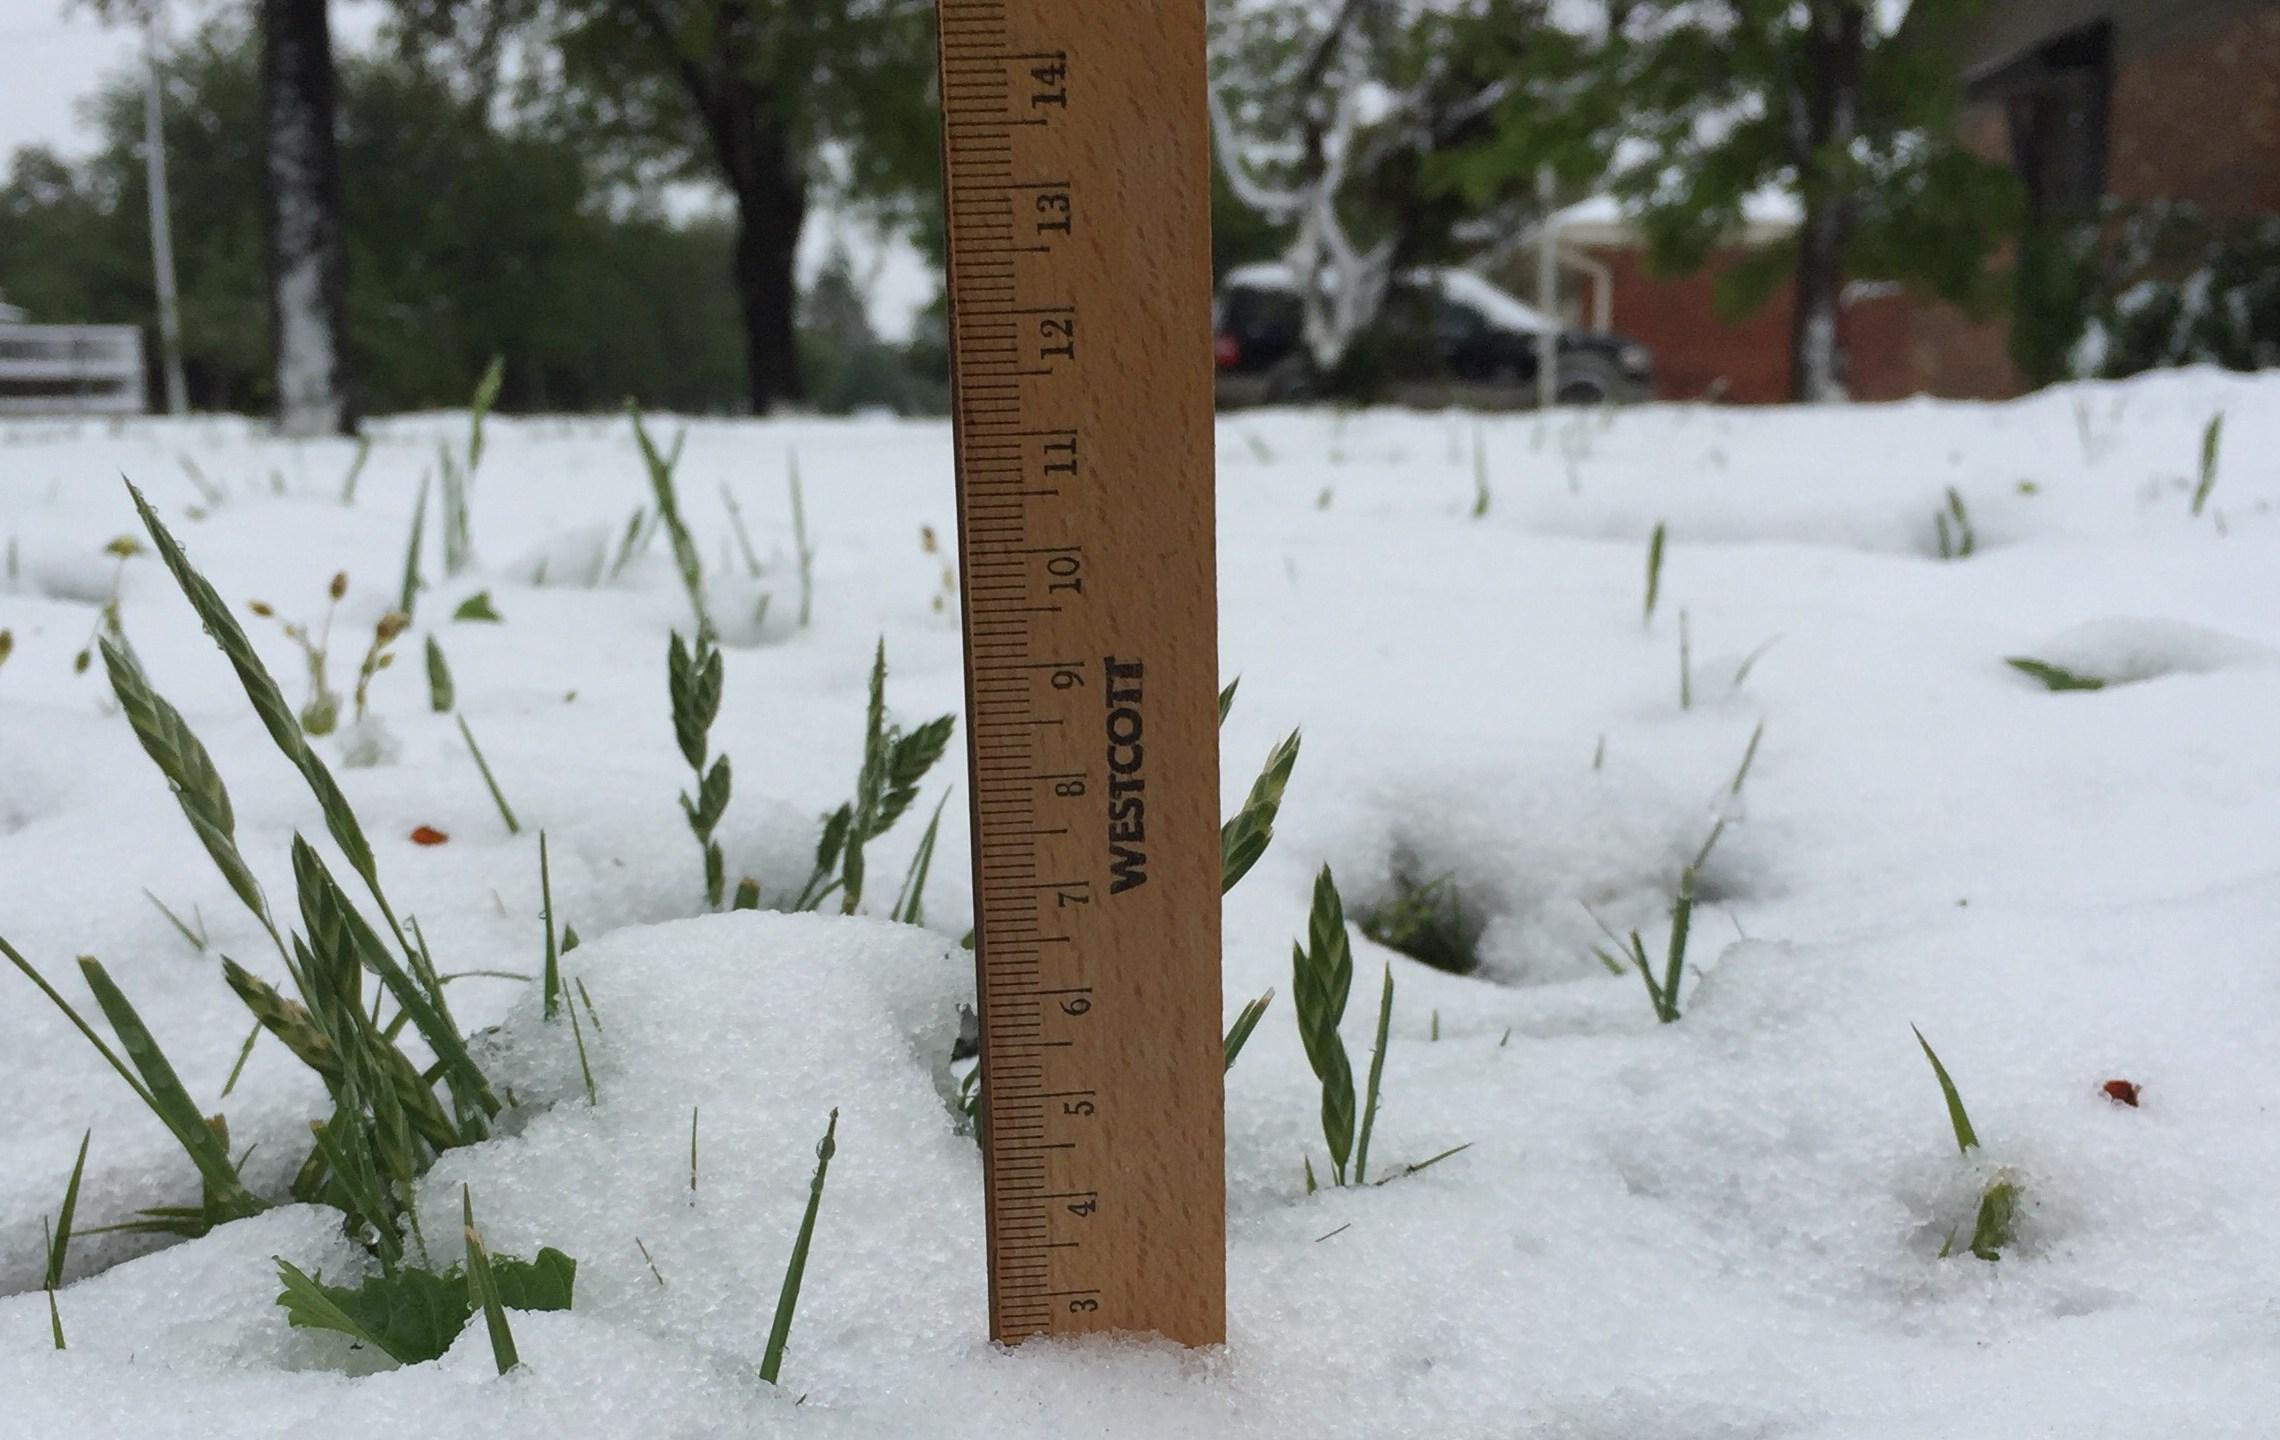 snow totals 4-30-17_1493572460951.jpg